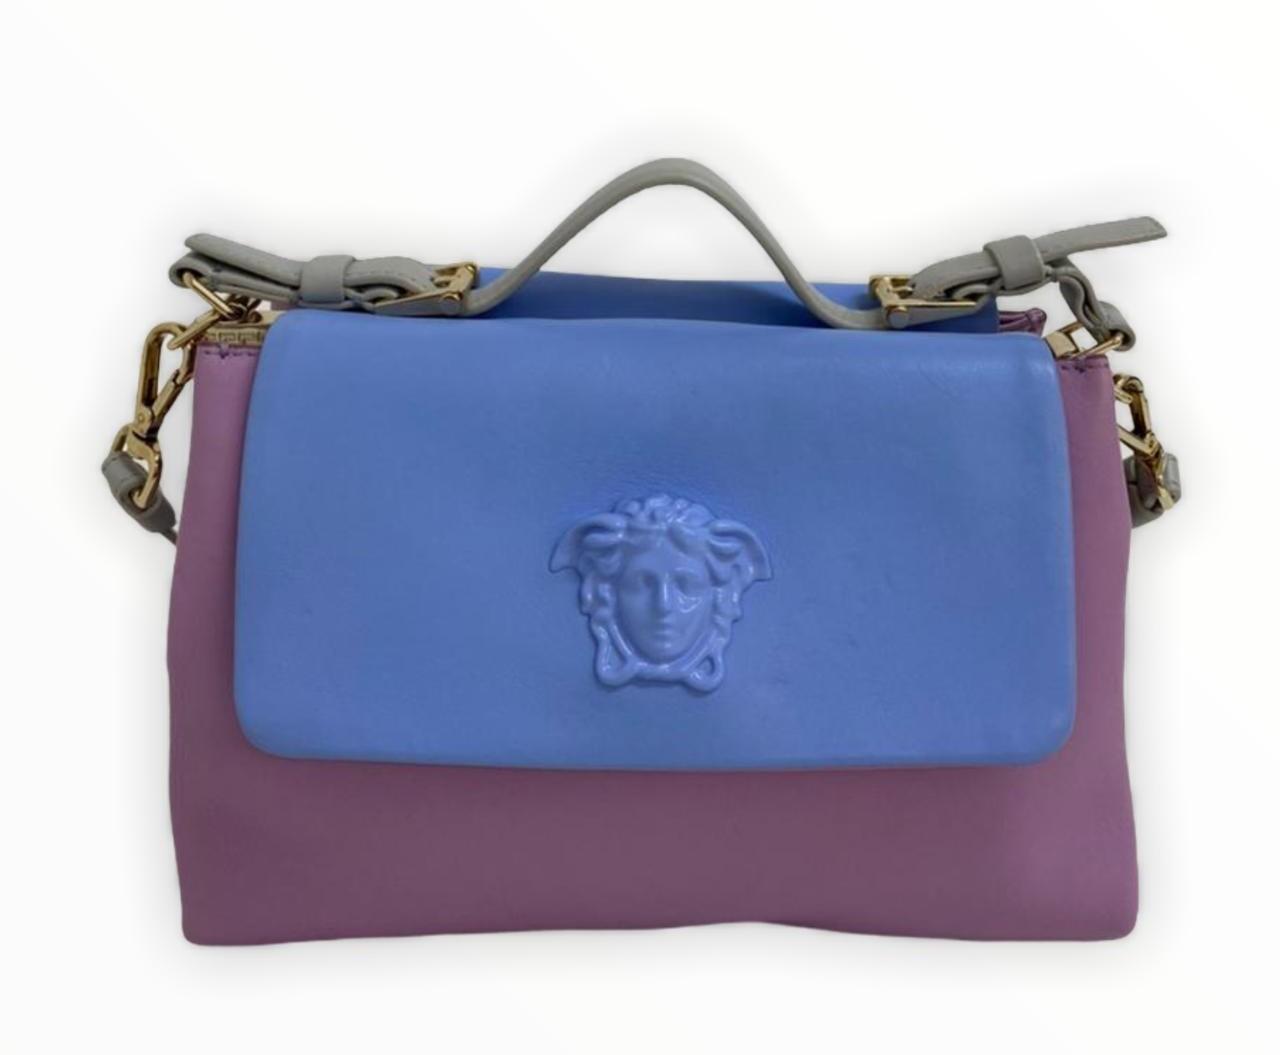 Bolsa Versace Two-Tone Medusa